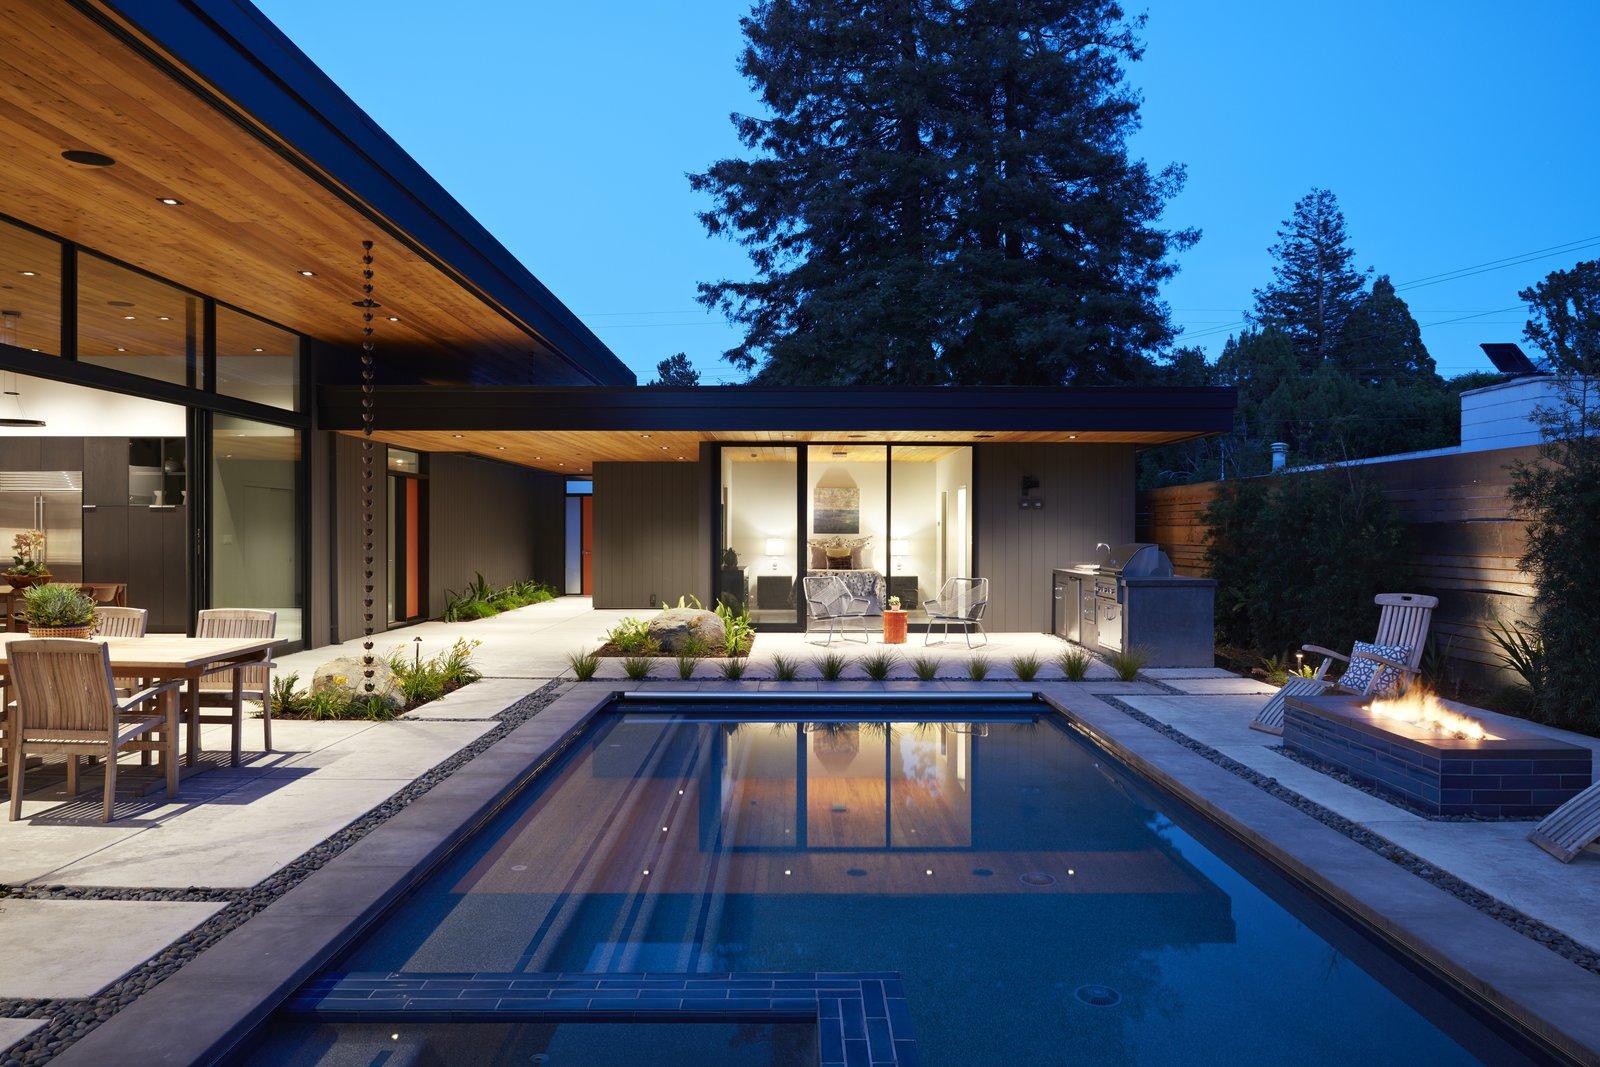 Klopf Architecture by Klopf Architecture